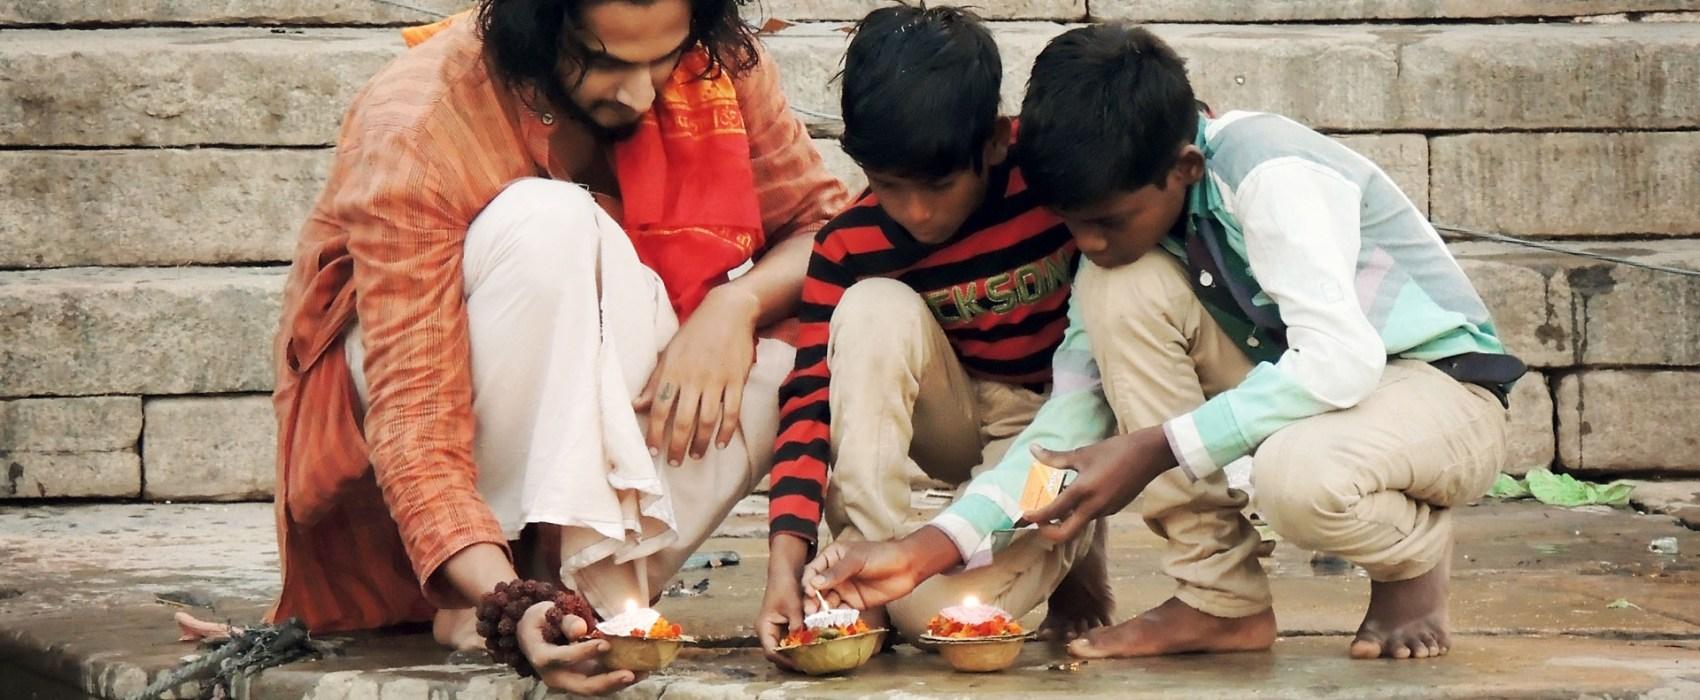 British imposition of caste on hindus